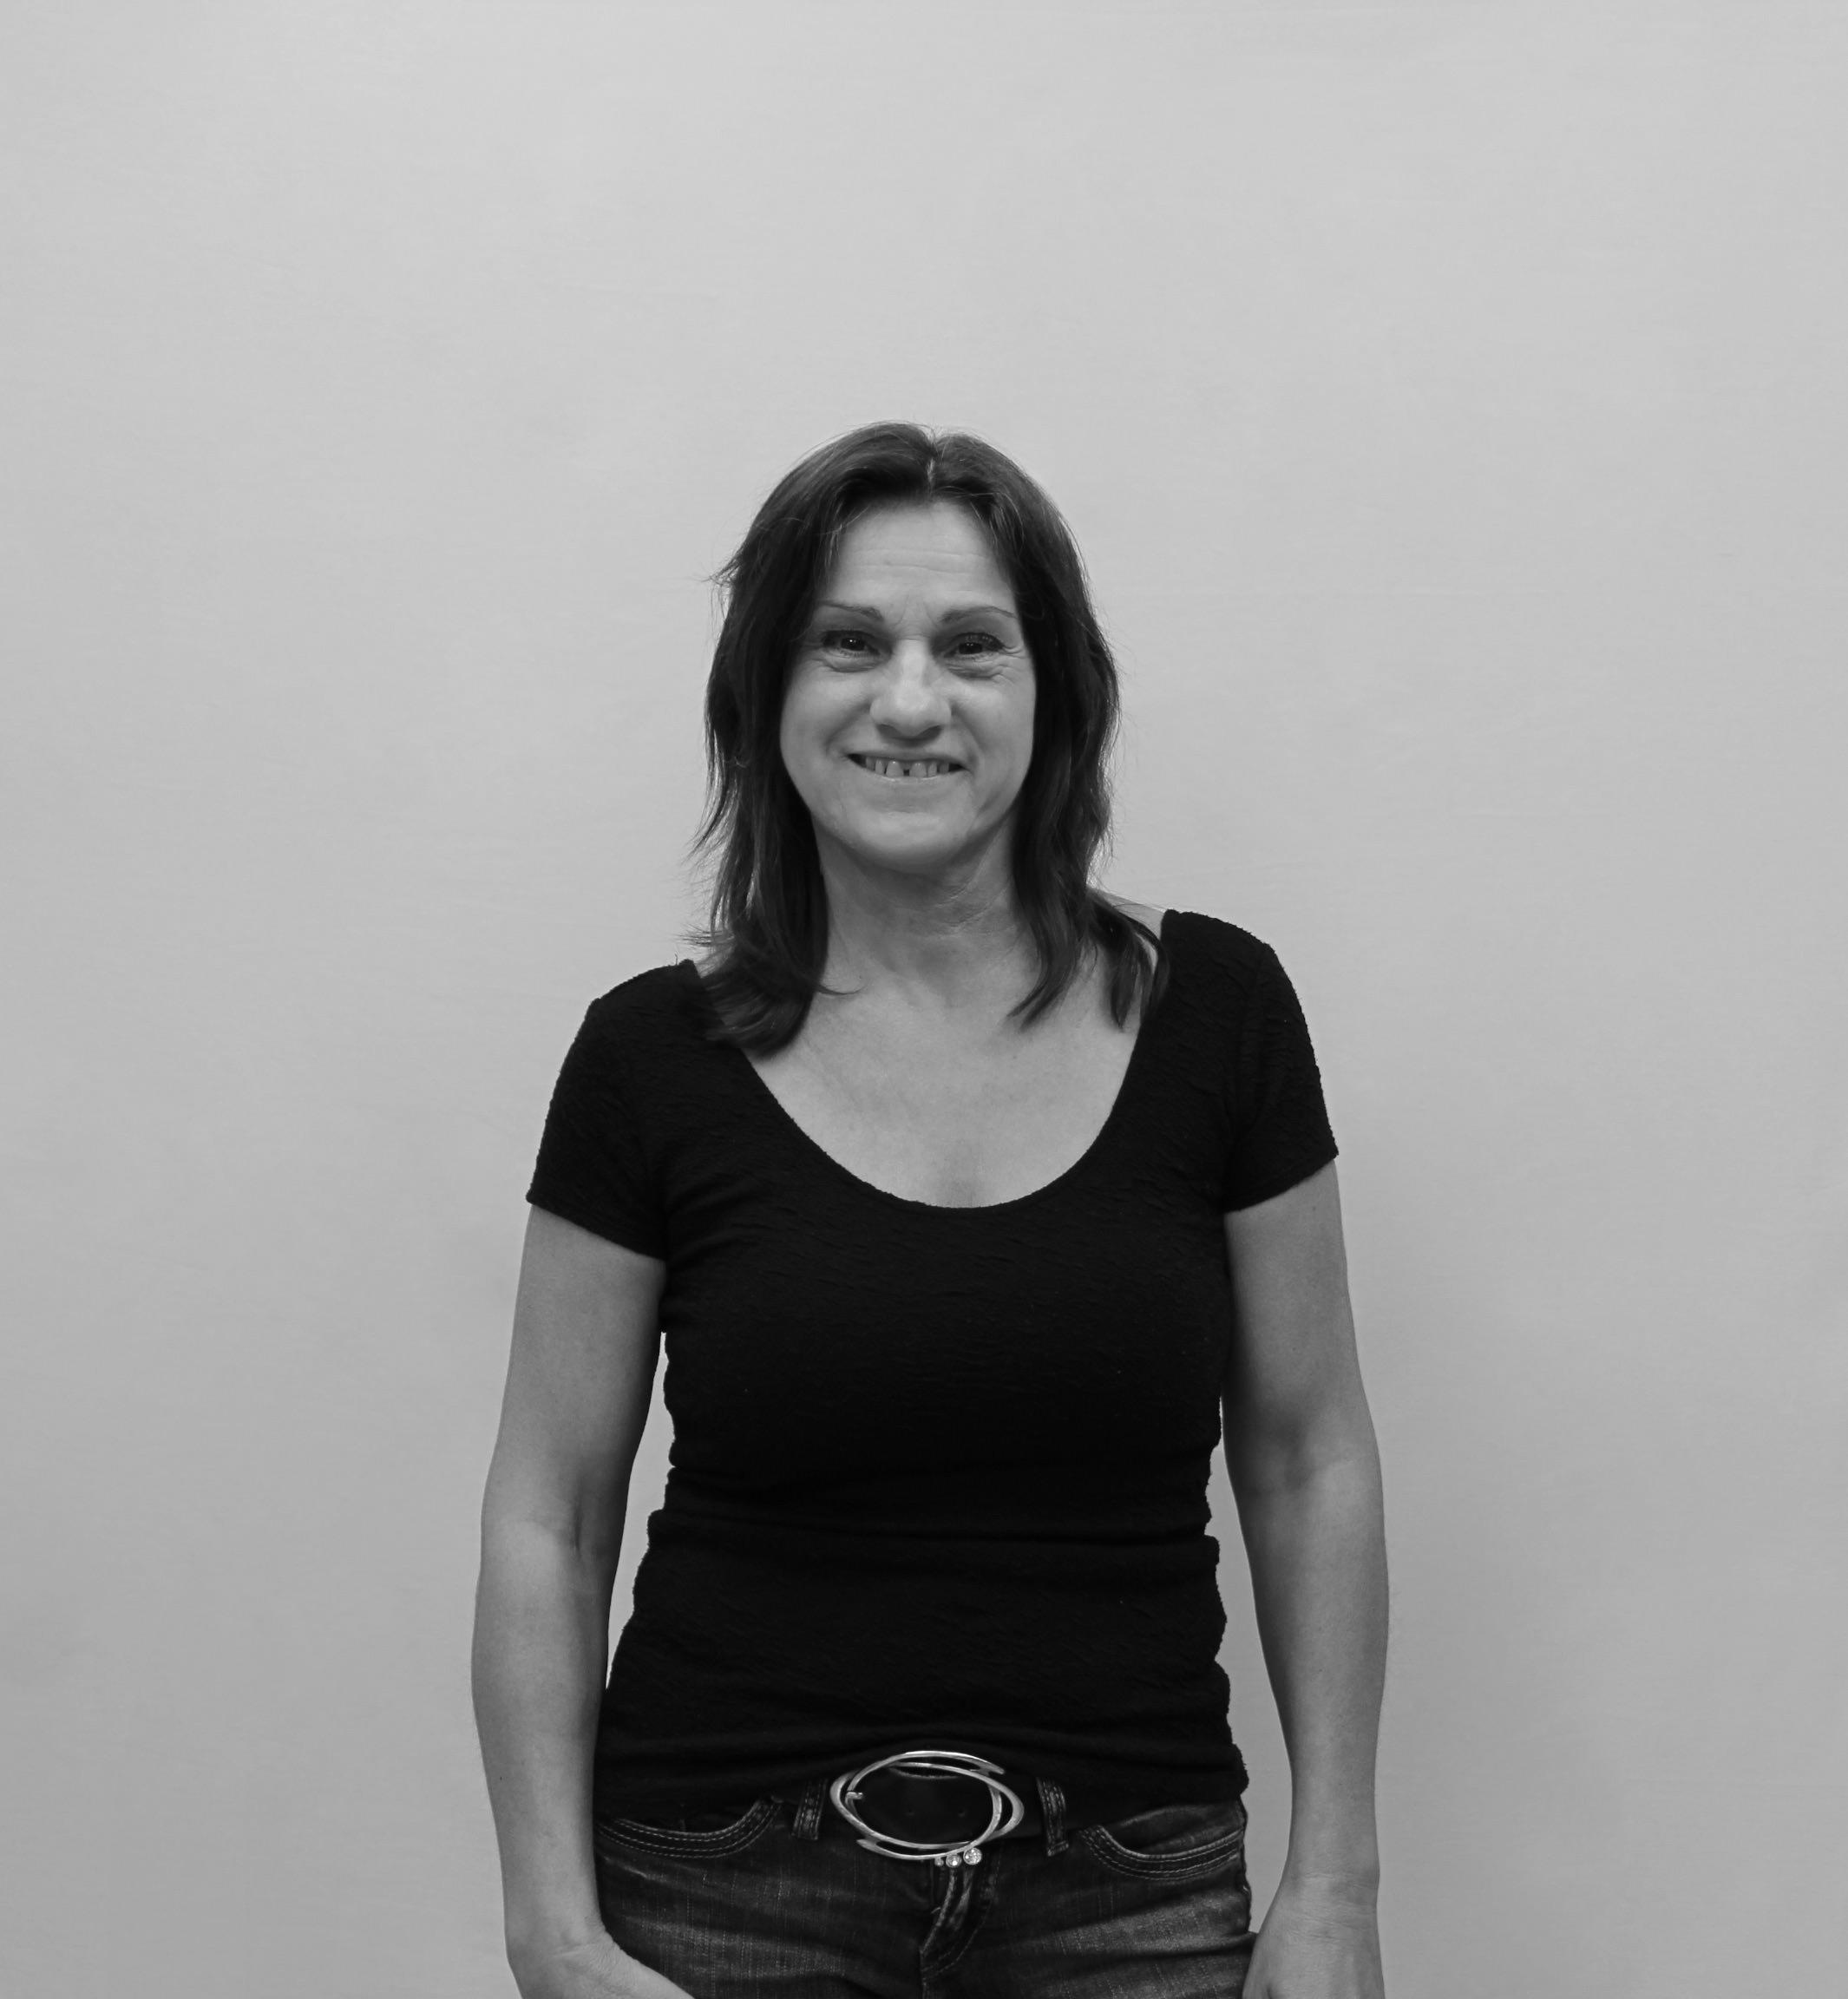 Diane <br>Boutin